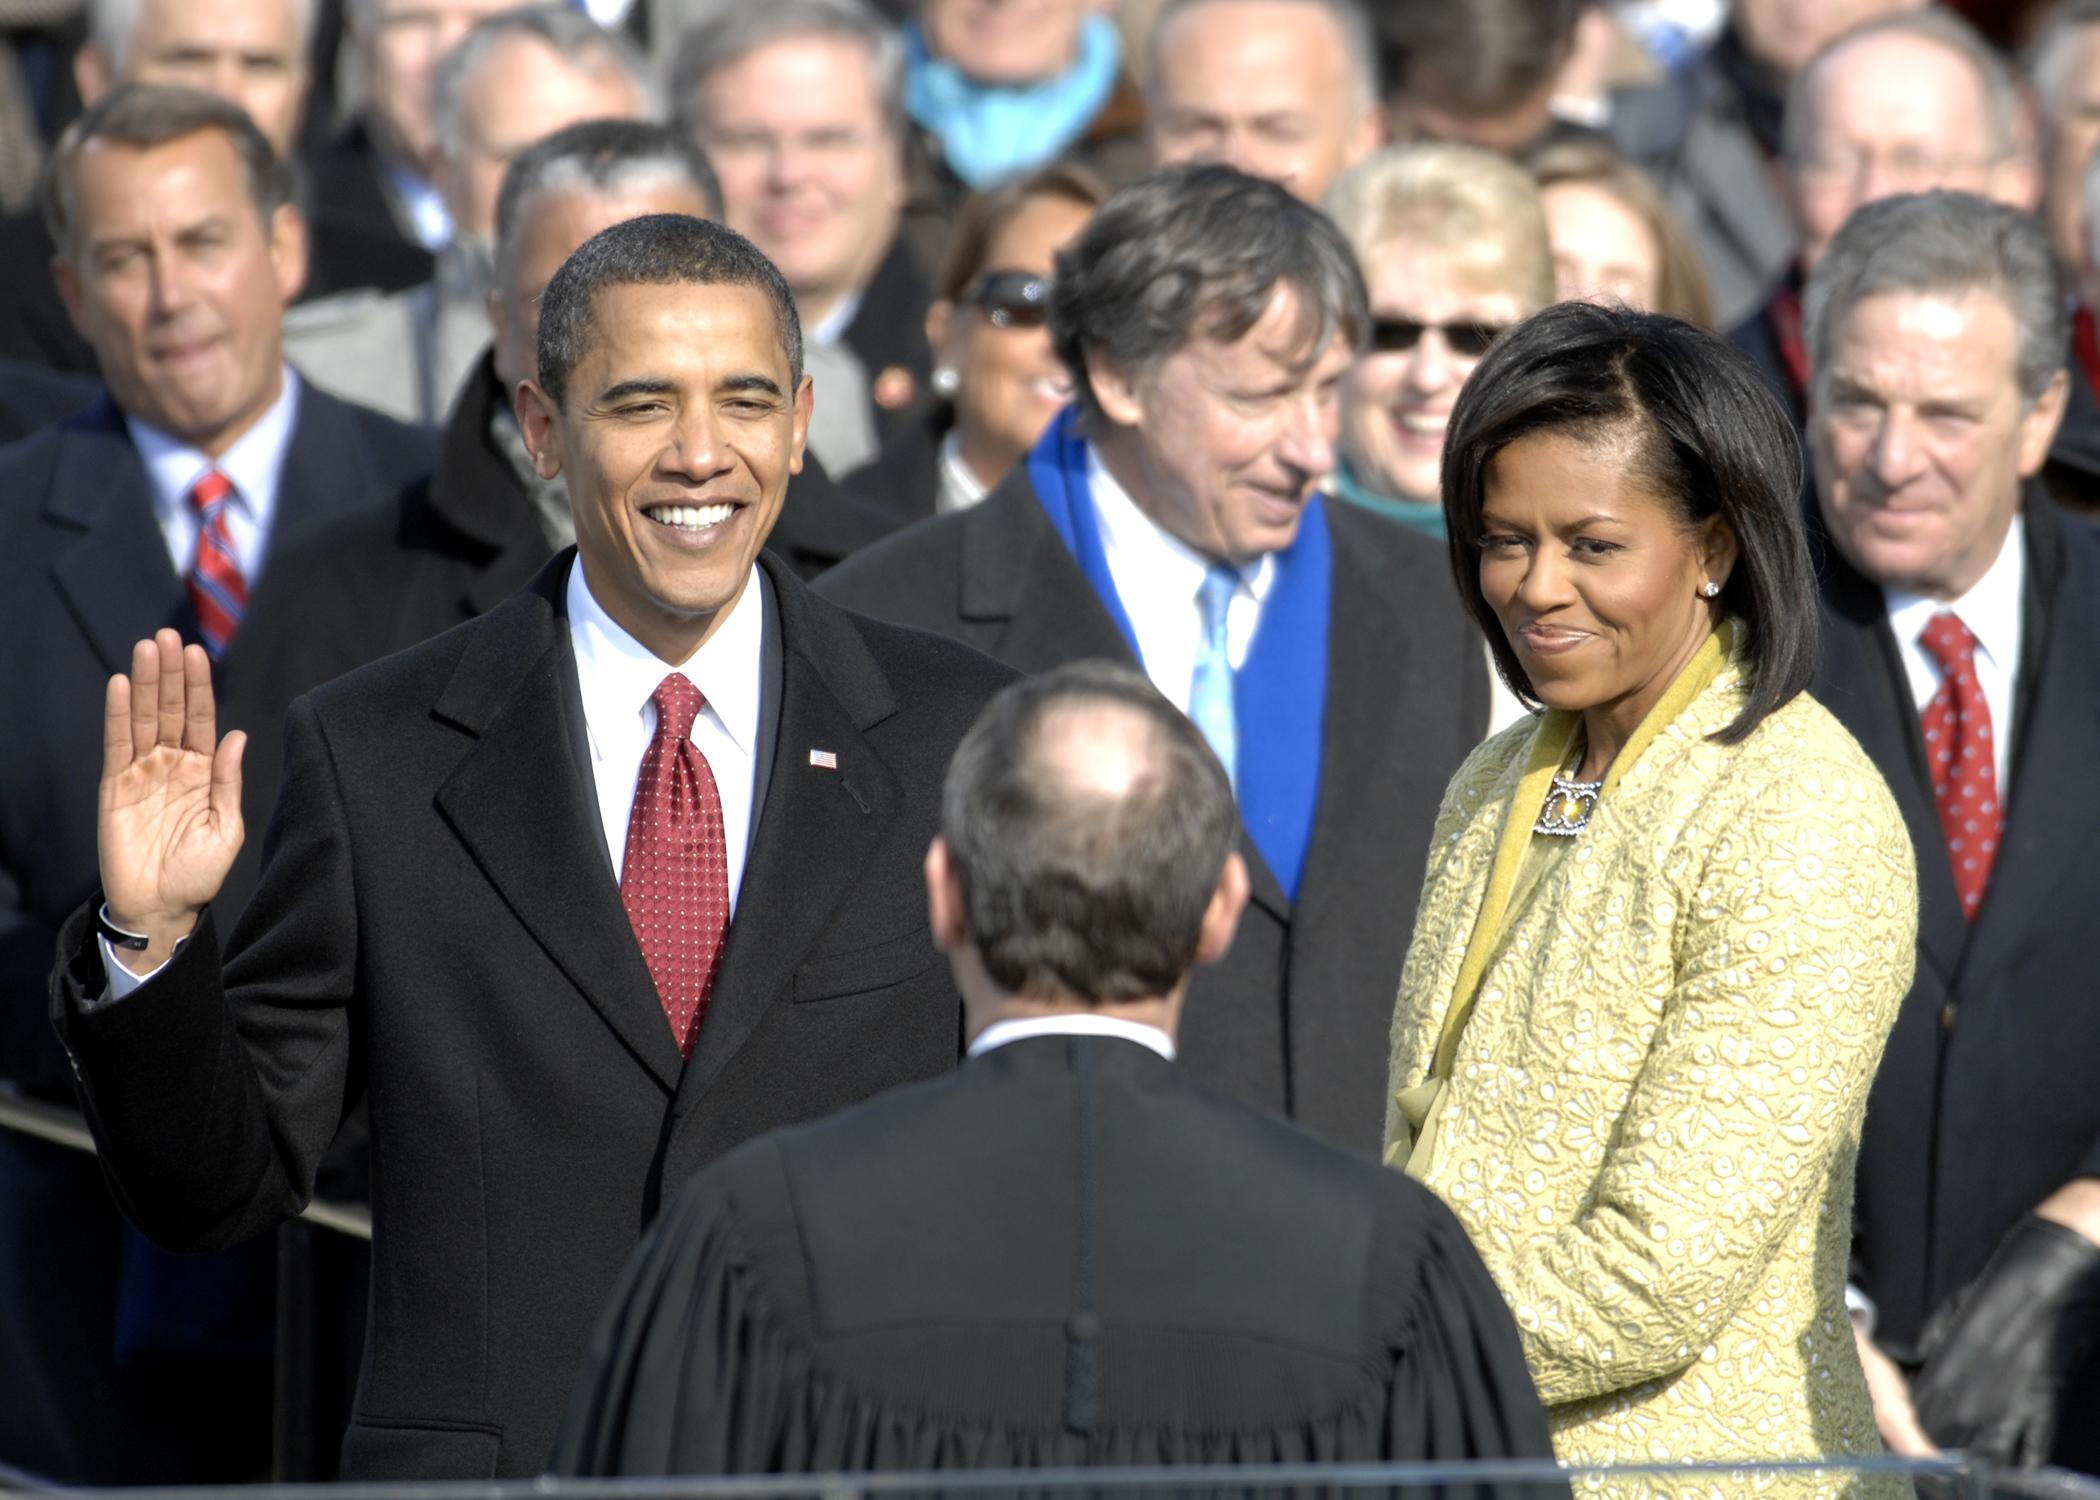 Obama first black president